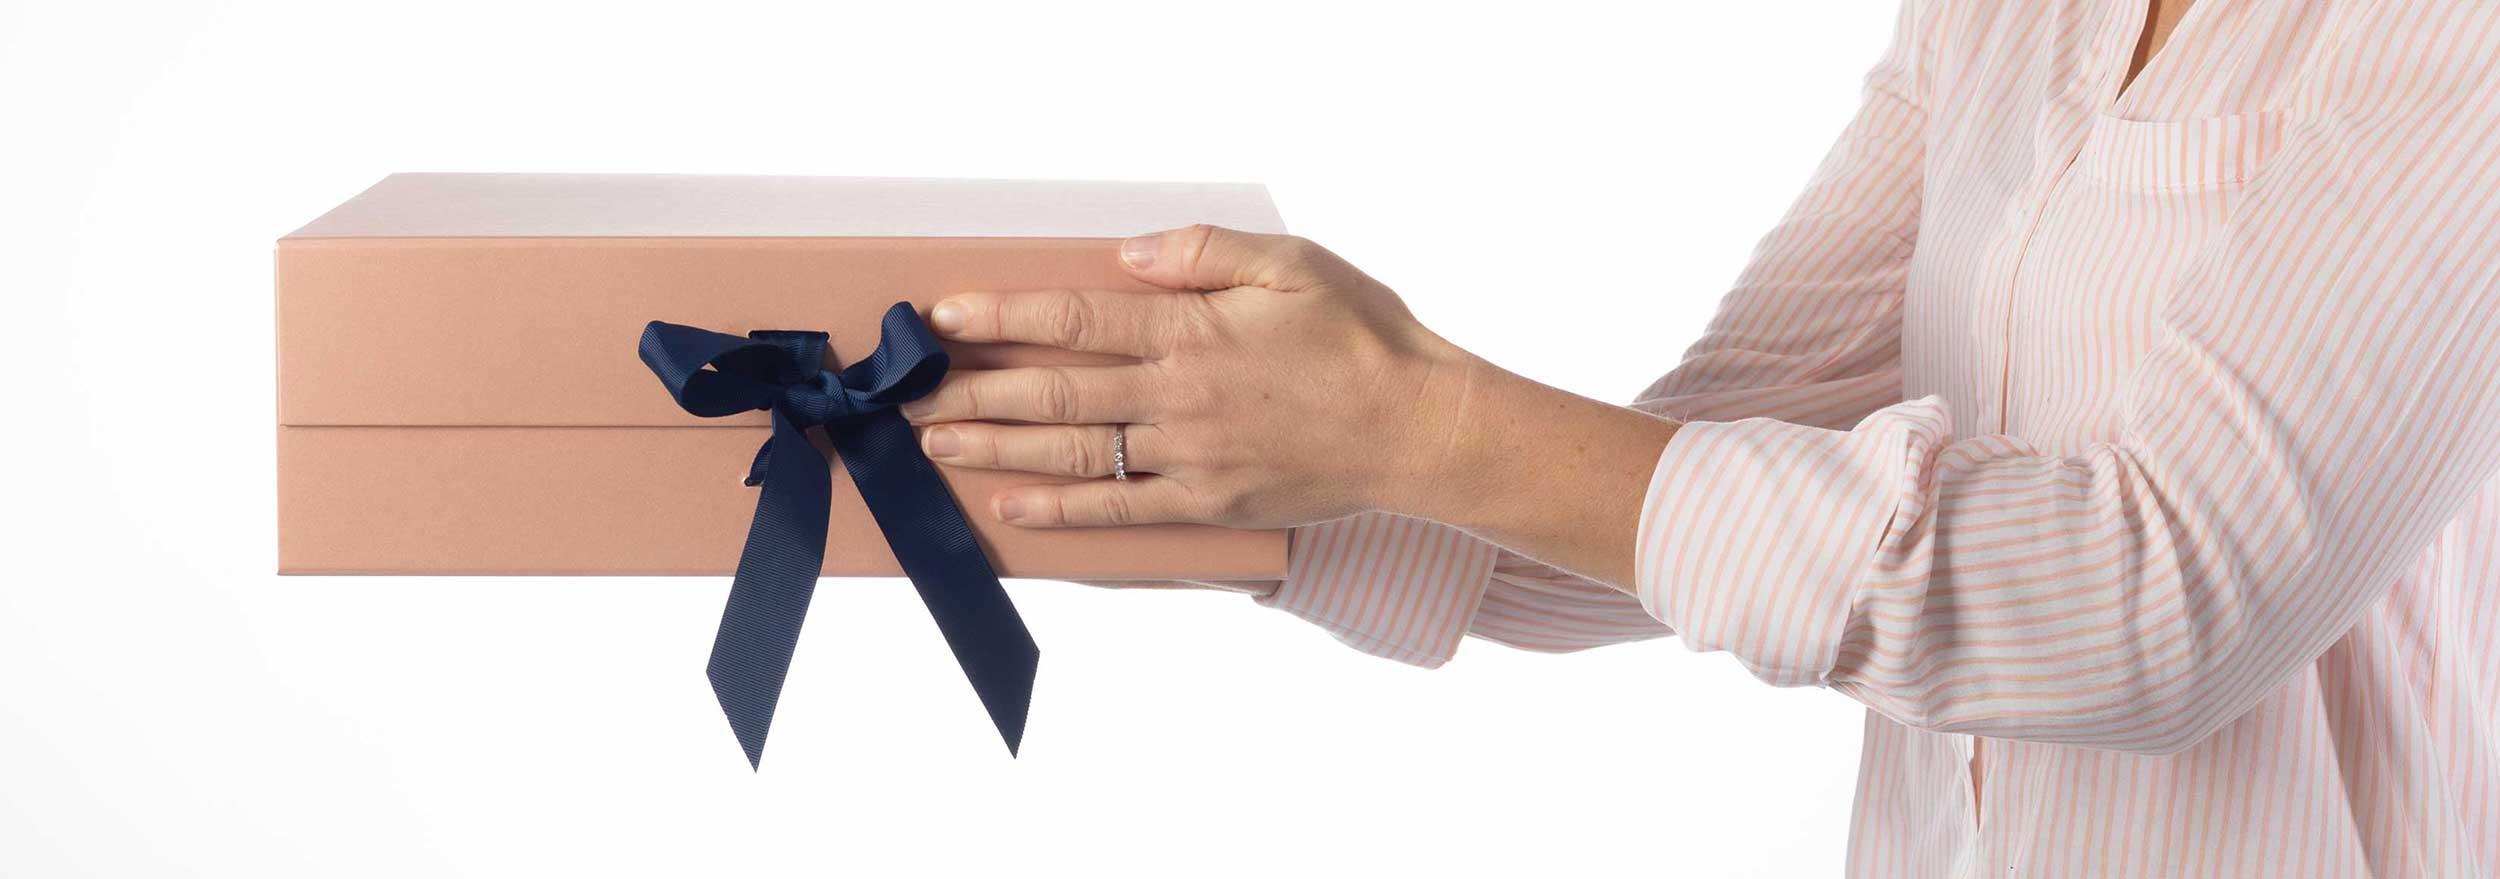 banner-cadeaux-boites-neuds-misyetmoi-confection-boitecadeau-donner-offrir-ideecadeau-mains